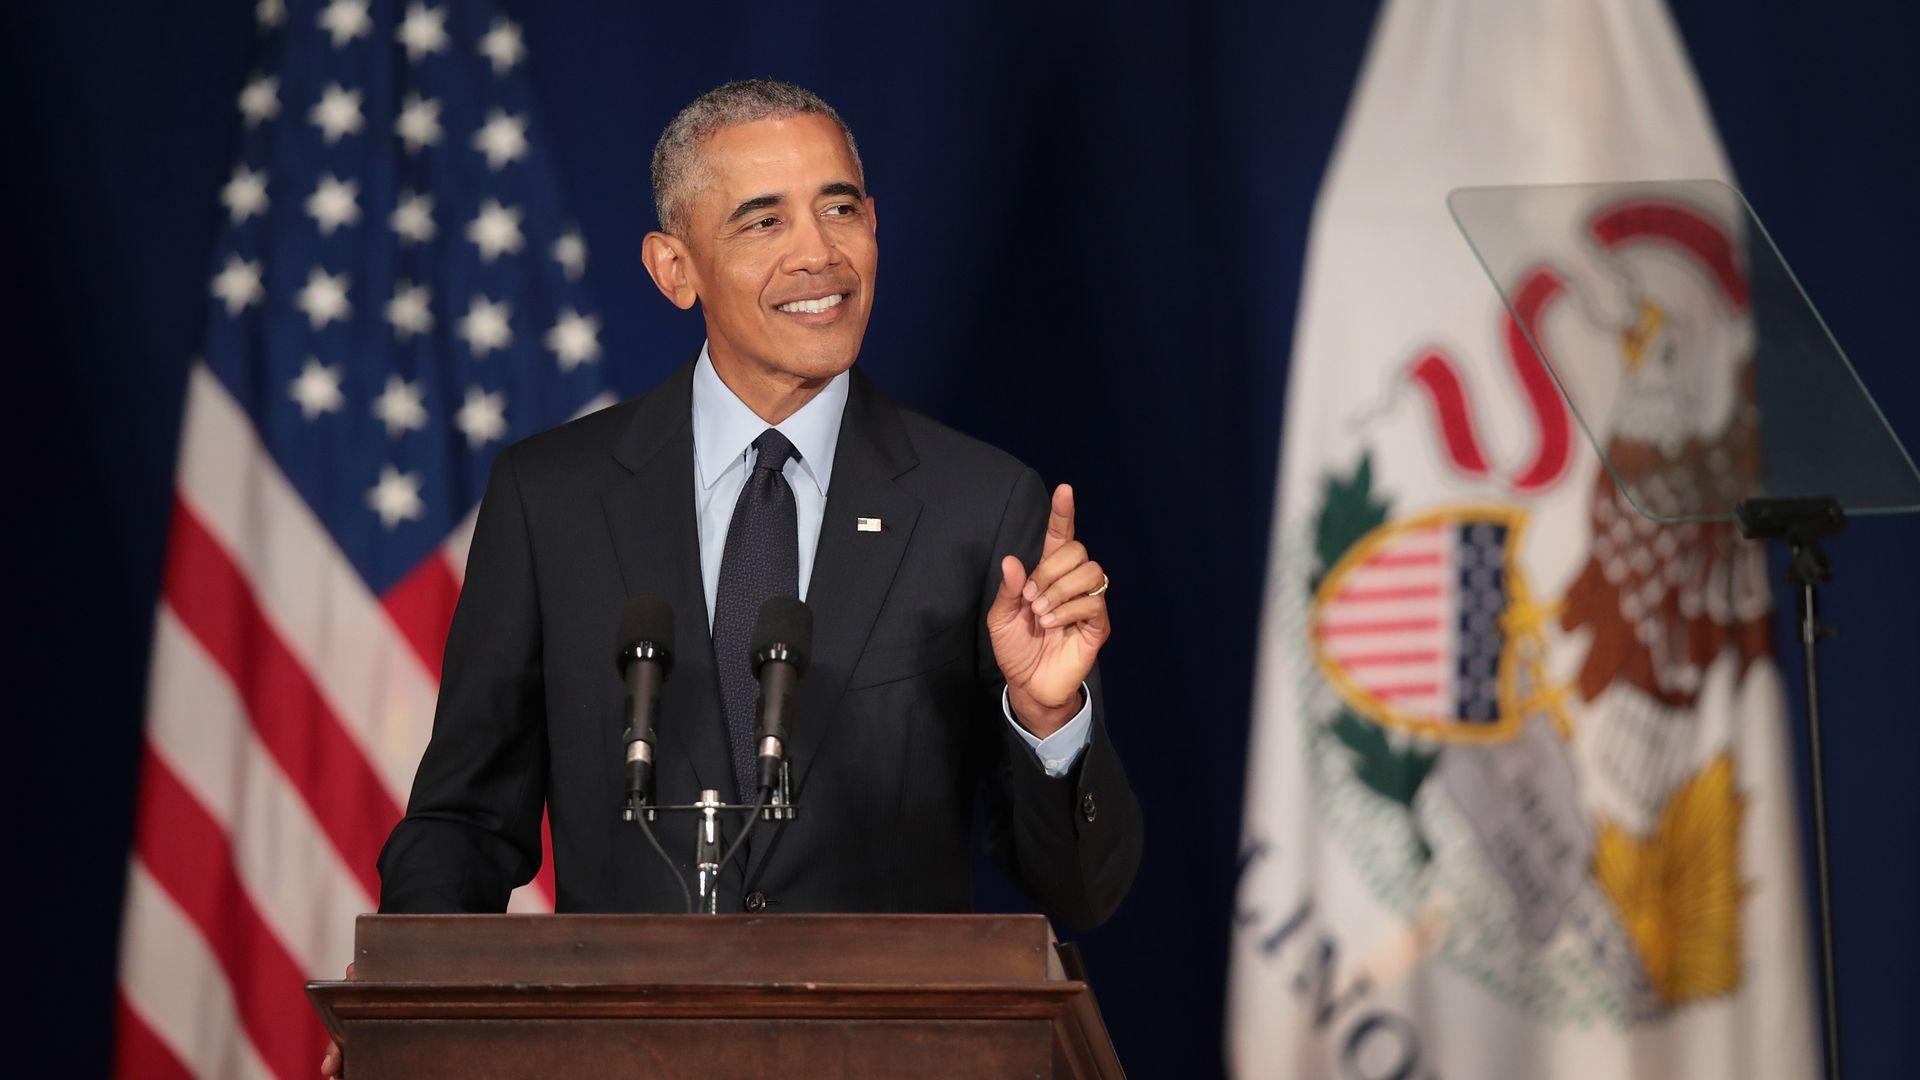 Former President Barack Obama speaks to students at the University of Illinois